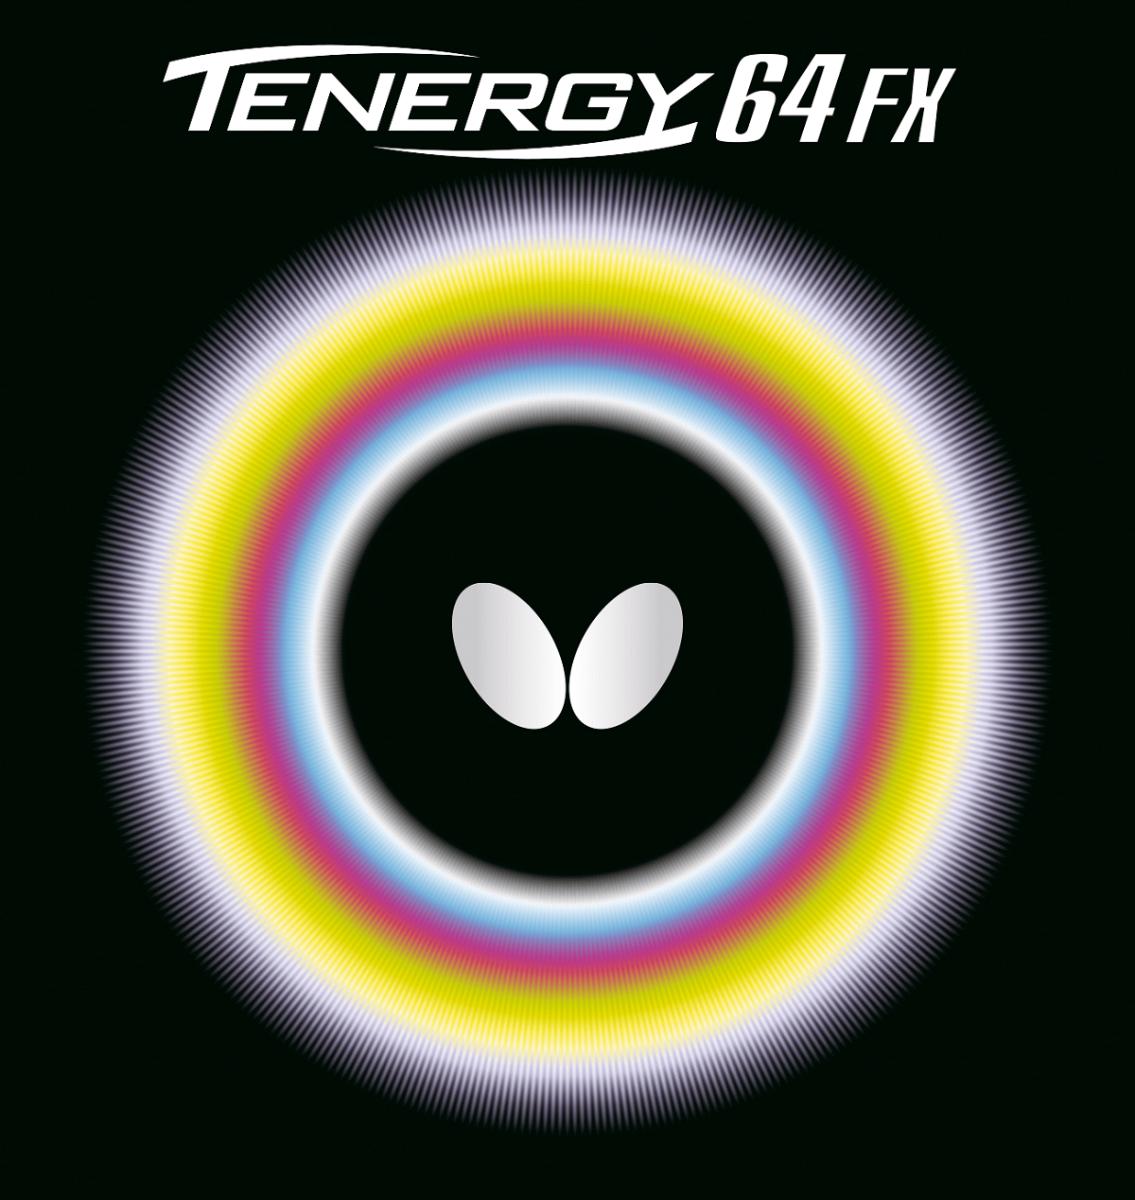 Butterfly Tenergy 64 FX